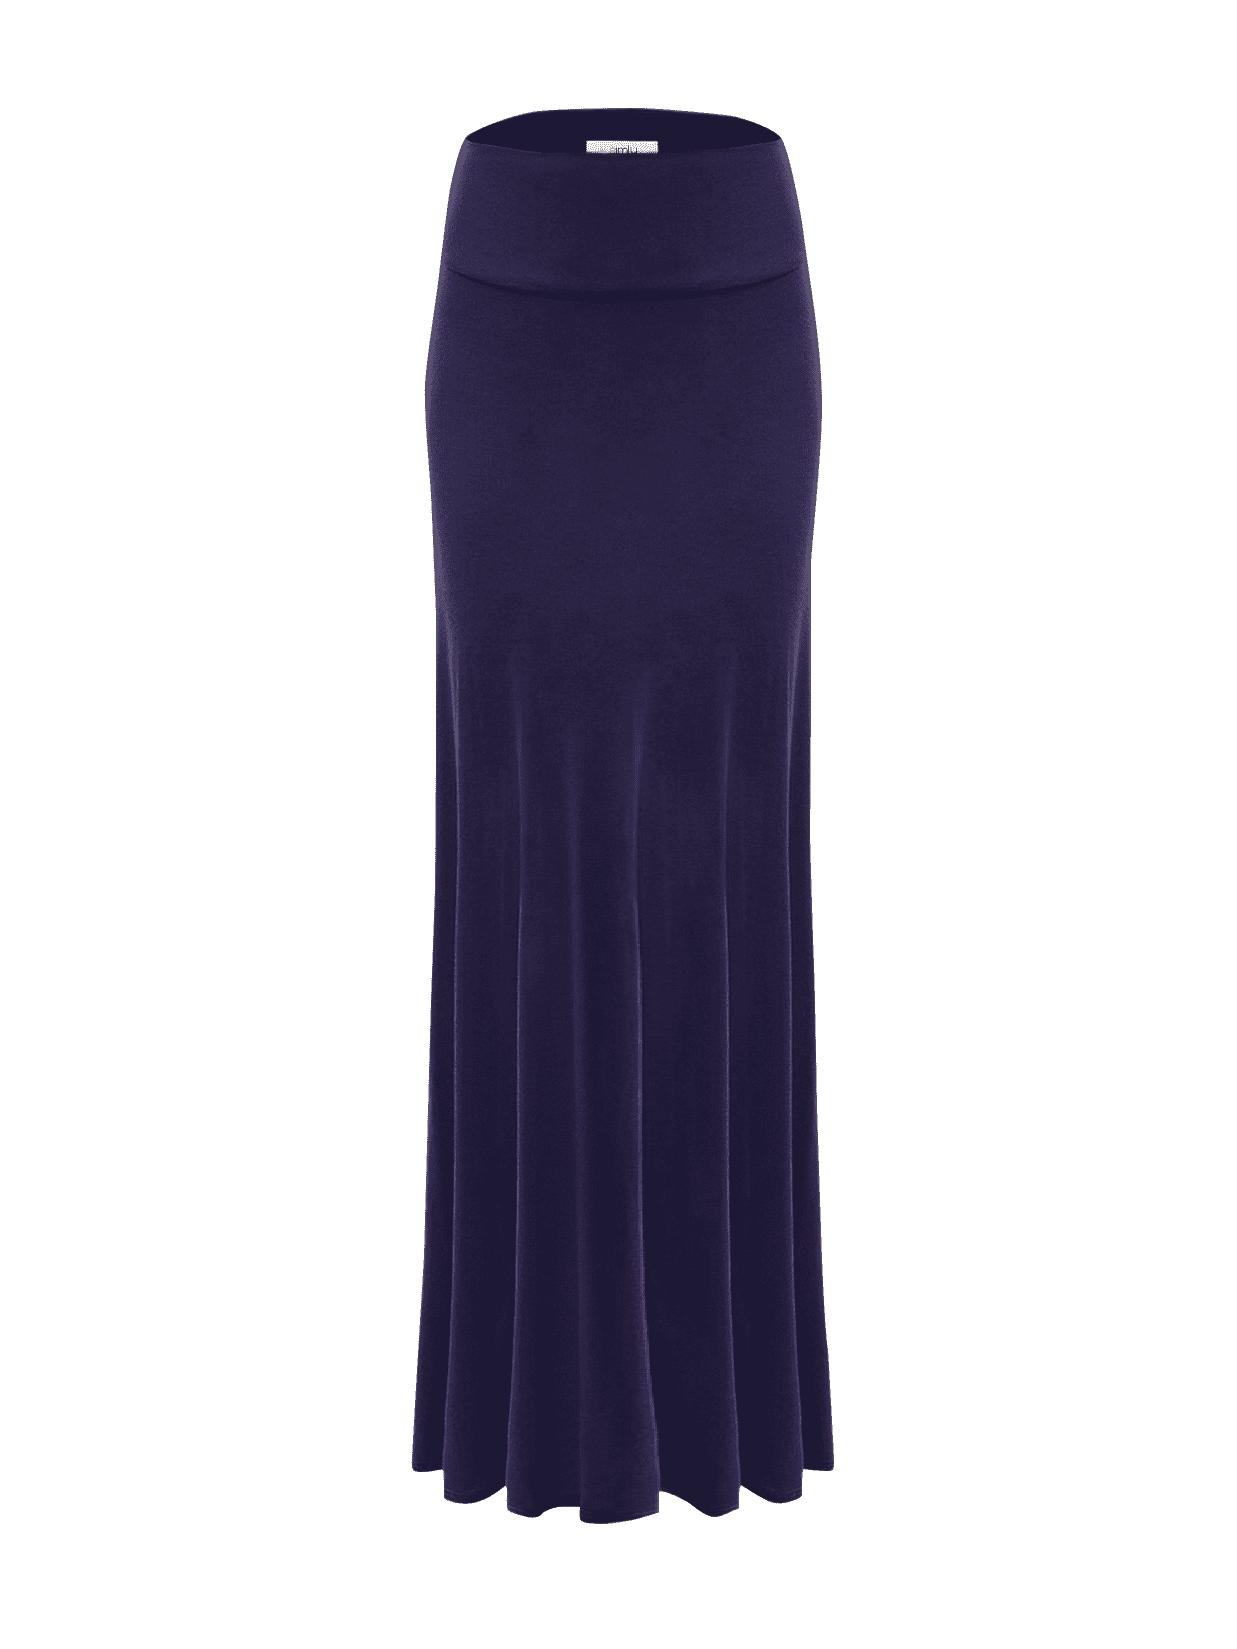 LL Womens Floor Length Maxi Skirt Made in USA